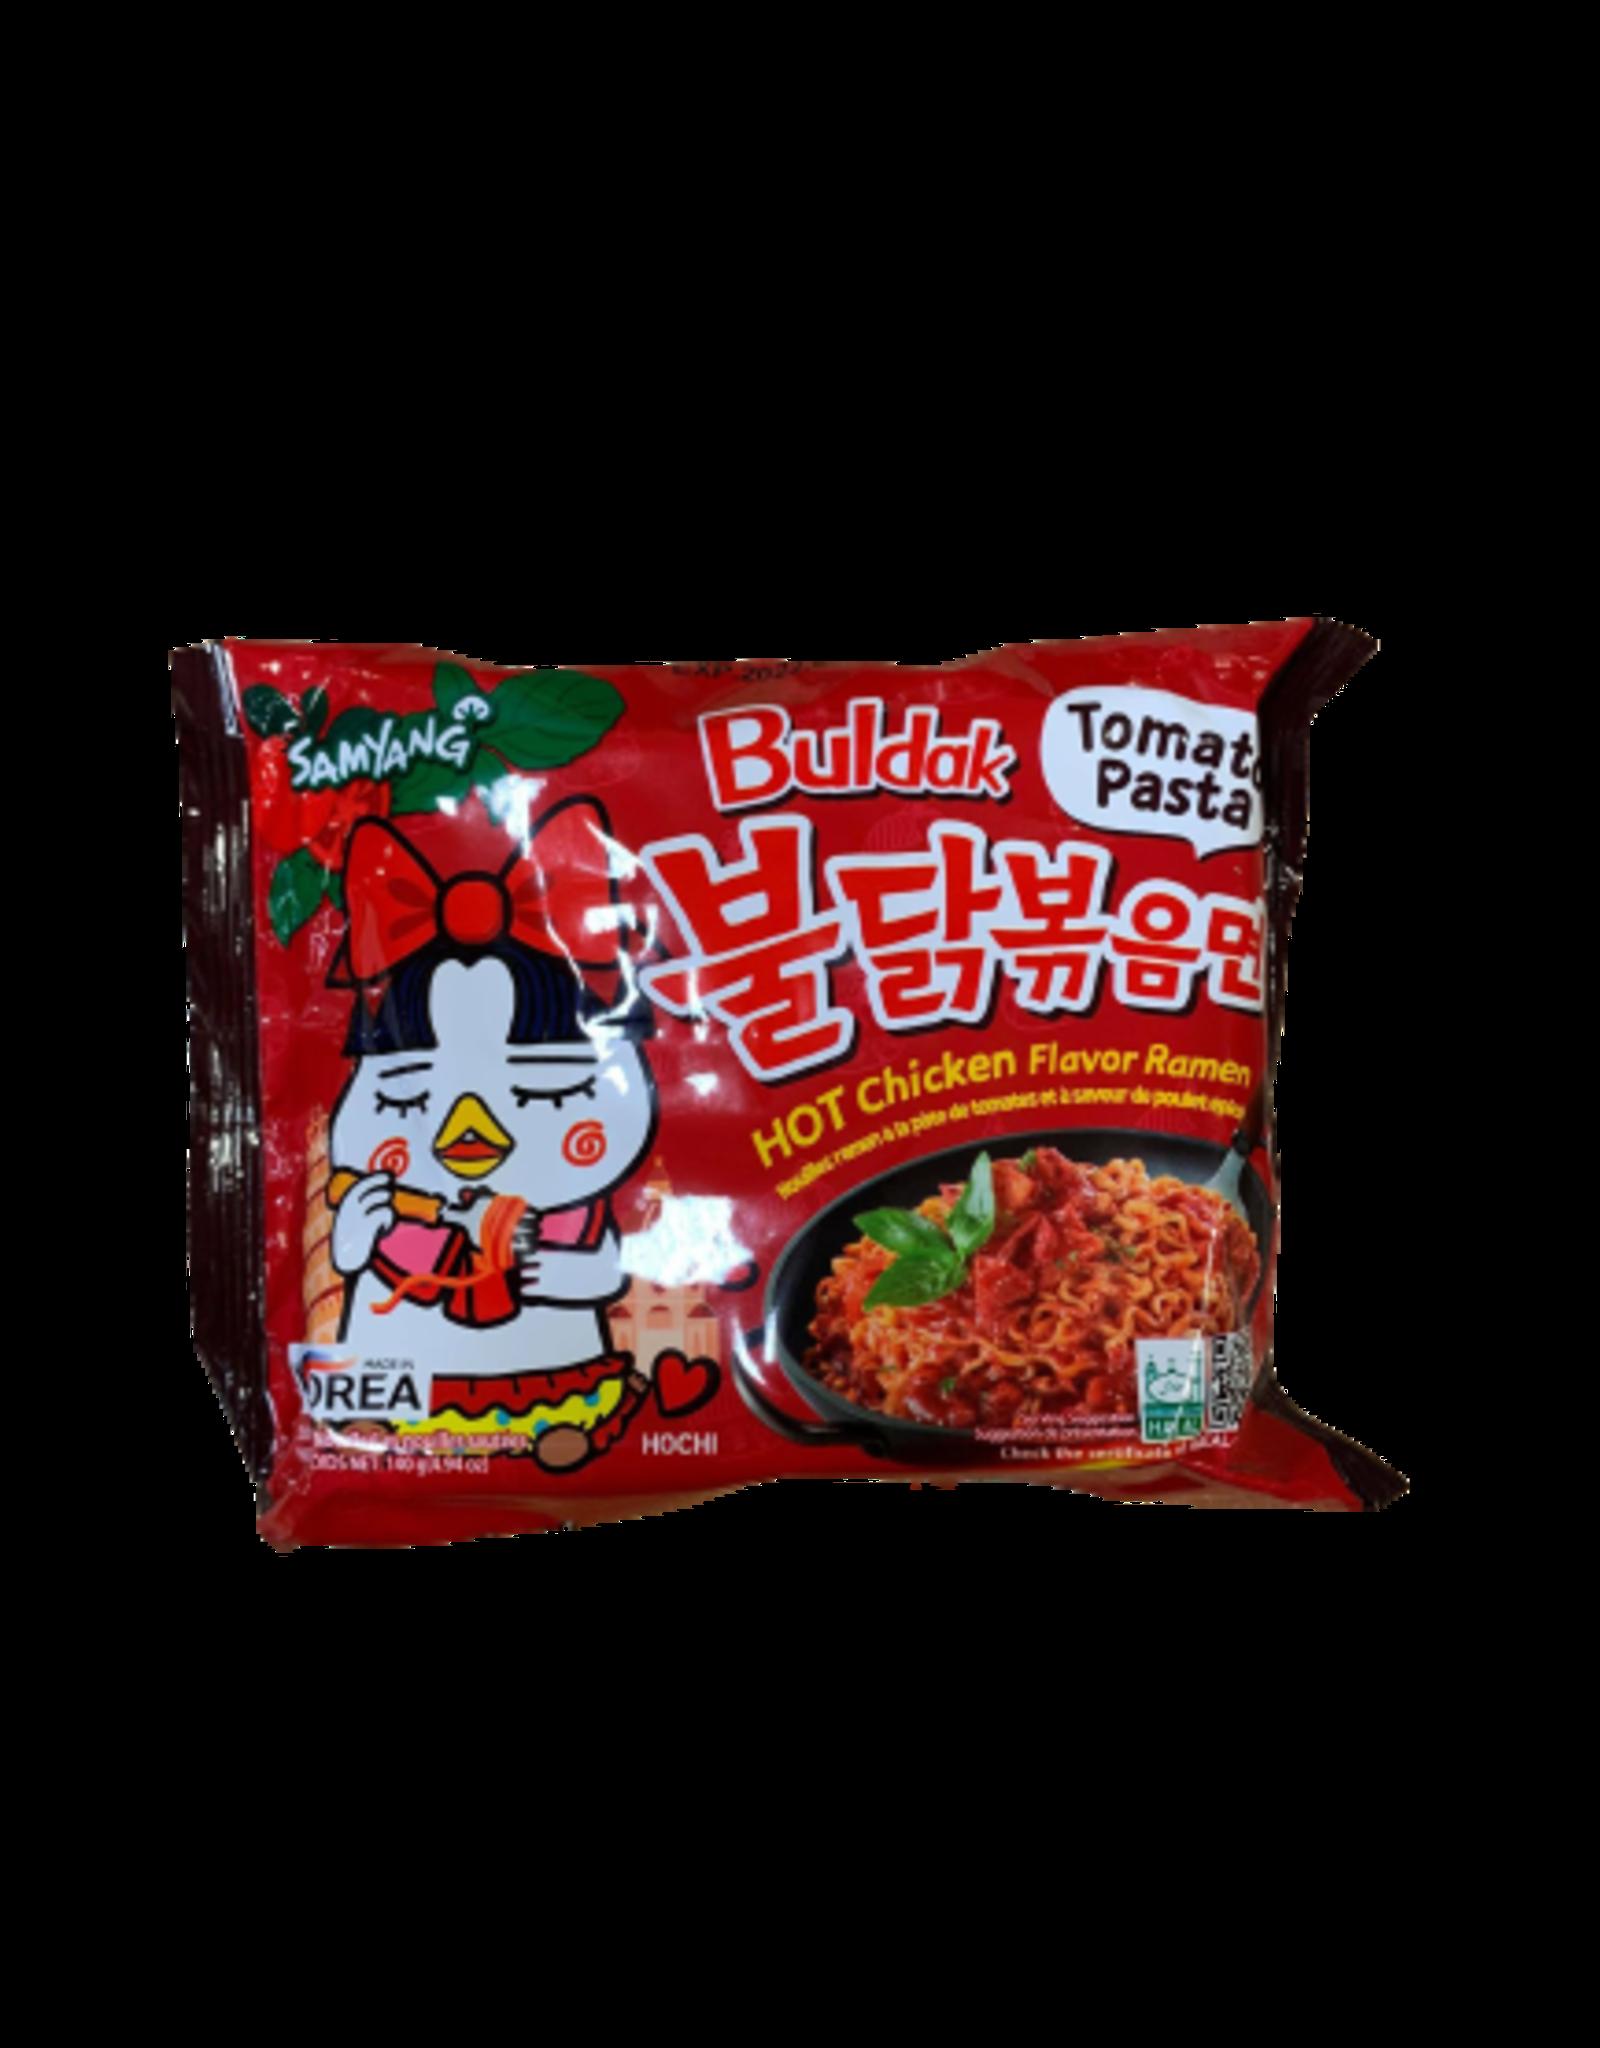 Samyang Spicy Tomato Pasta